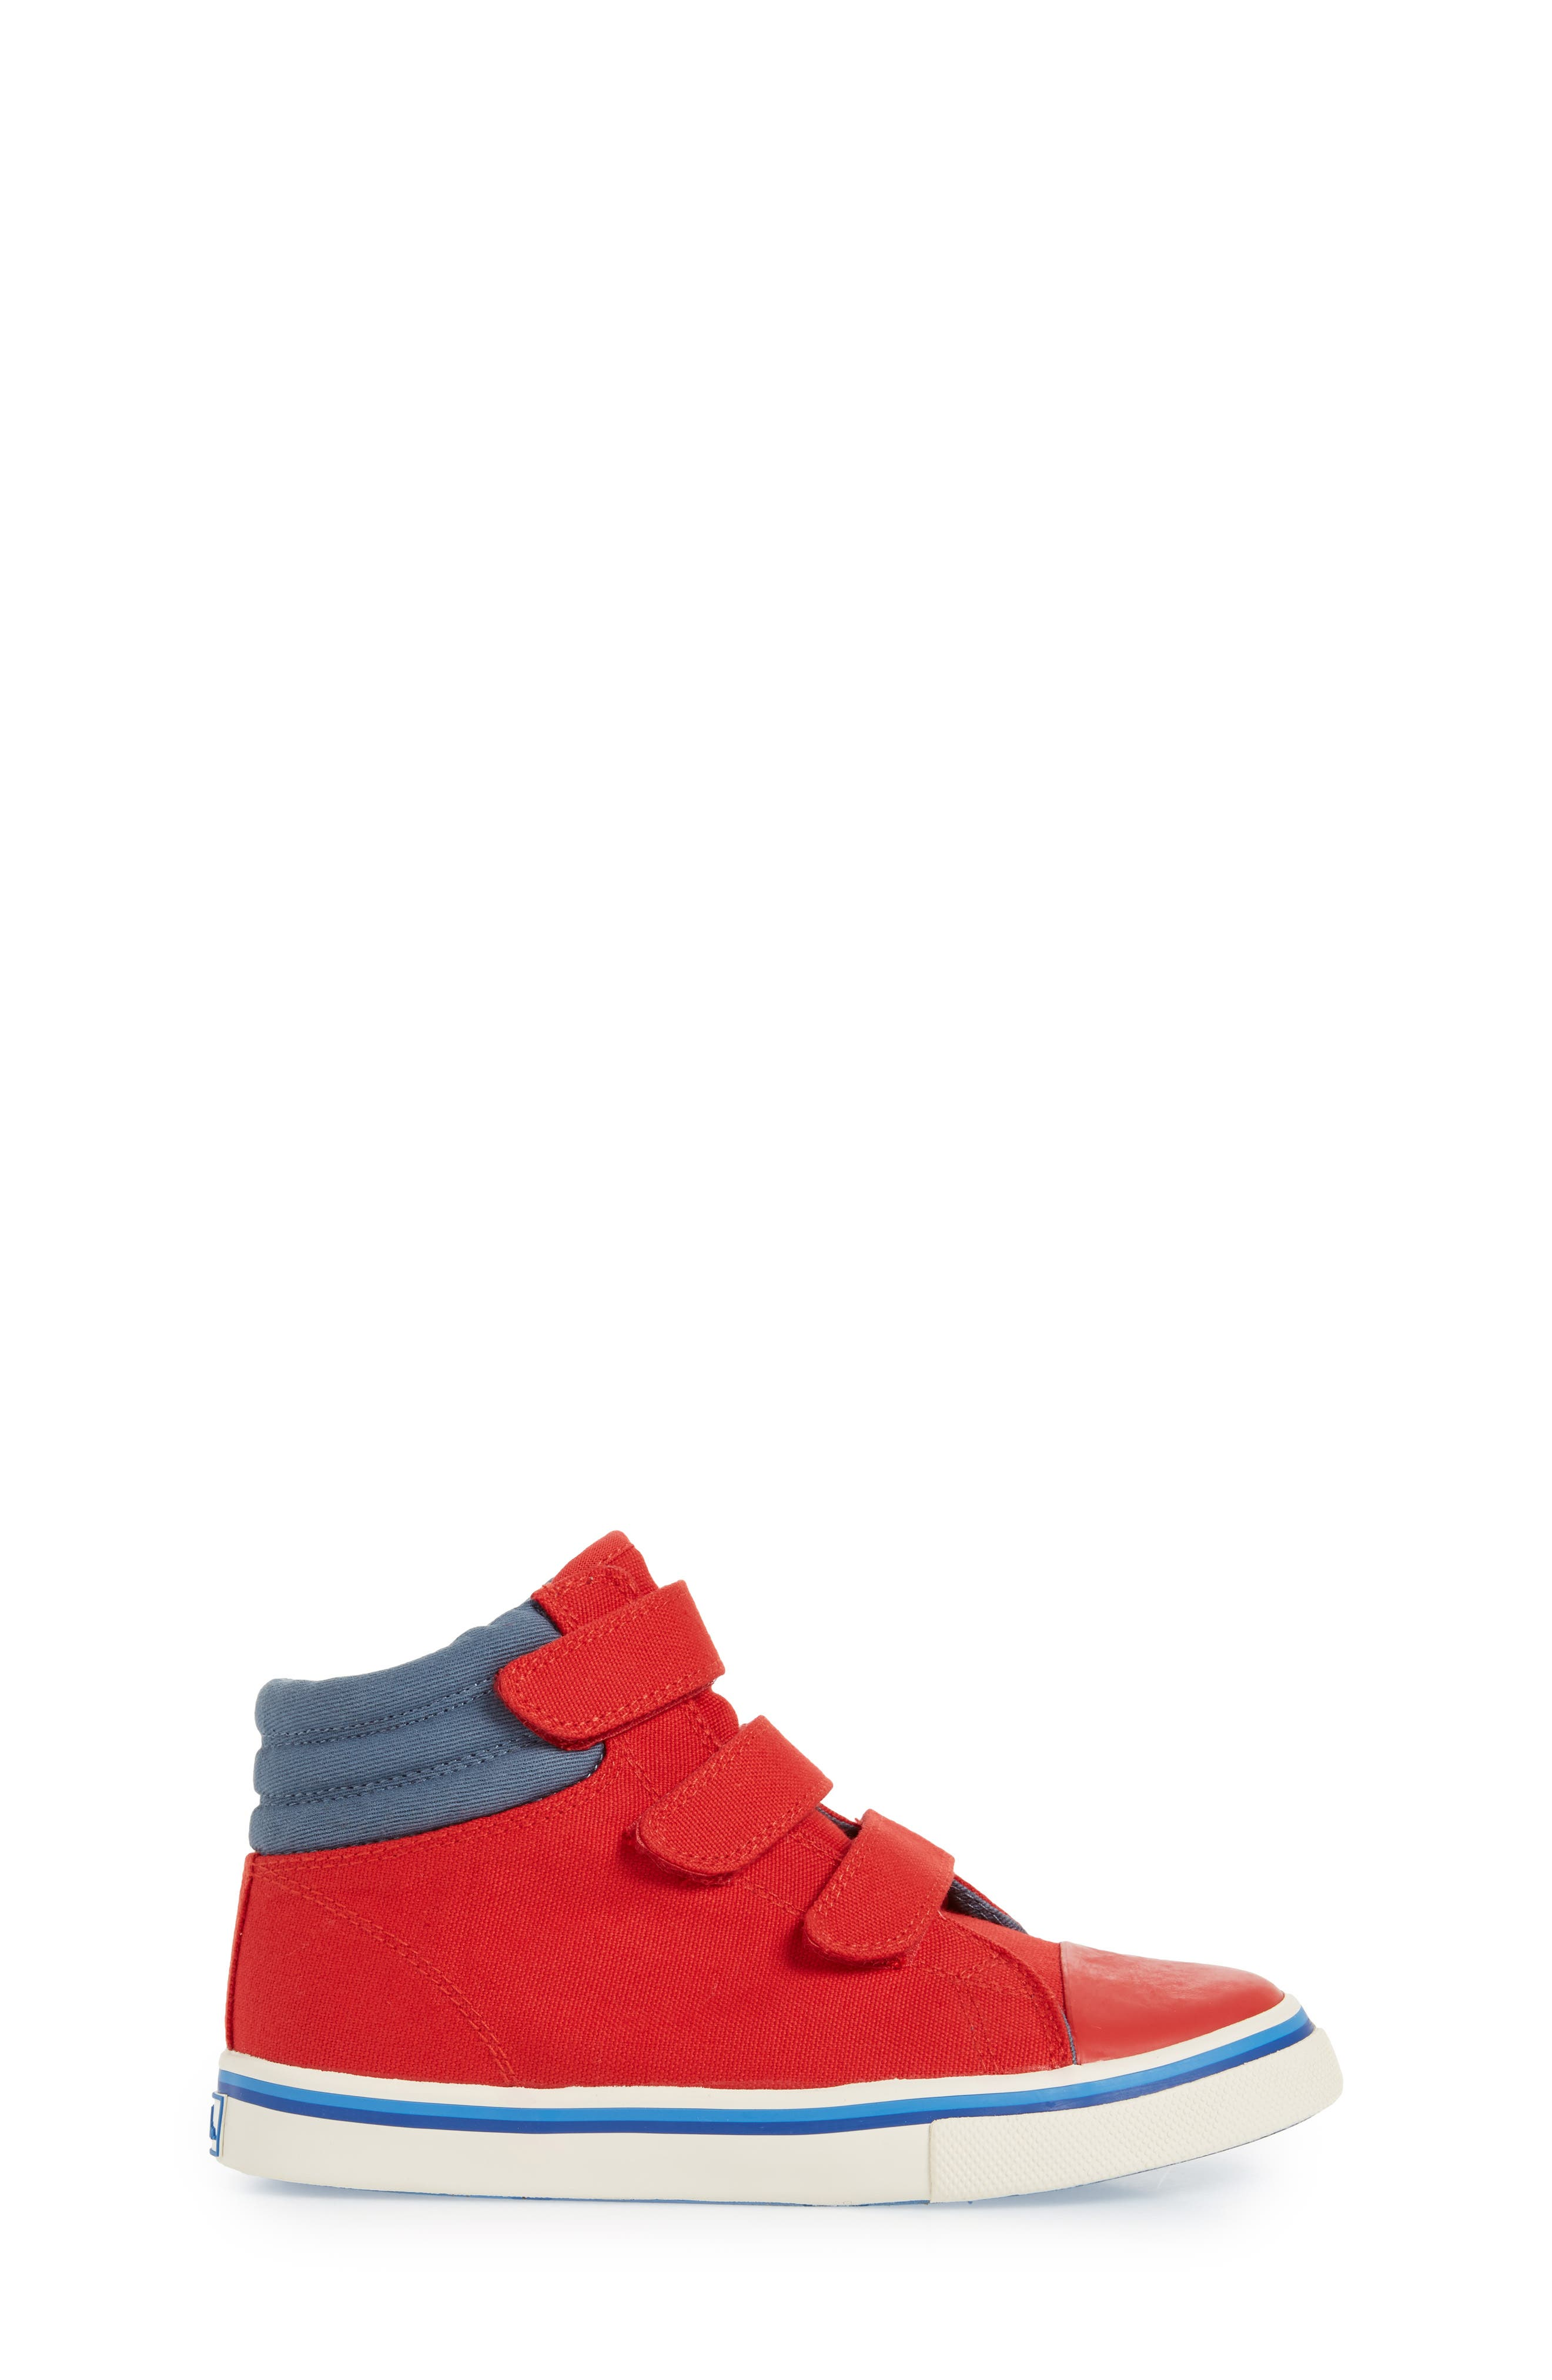 High Top Sneaker,                             Alternate thumbnail 3, color,                             614